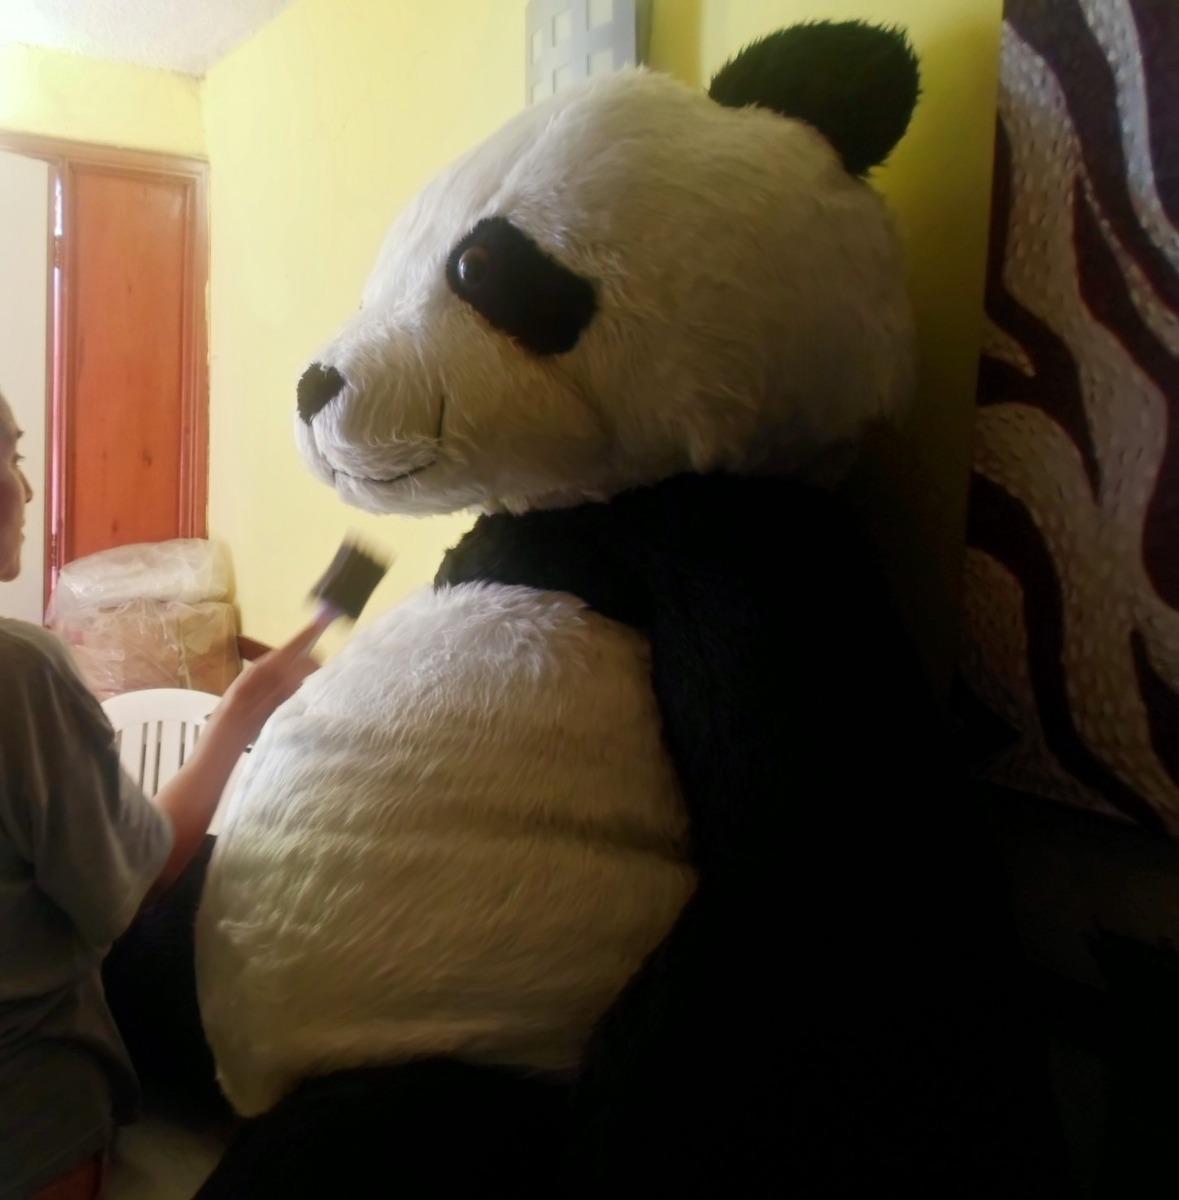 oso panda gigante de peluche 2 mts altura jumbo super. Black Bedroom Furniture Sets. Home Design Ideas